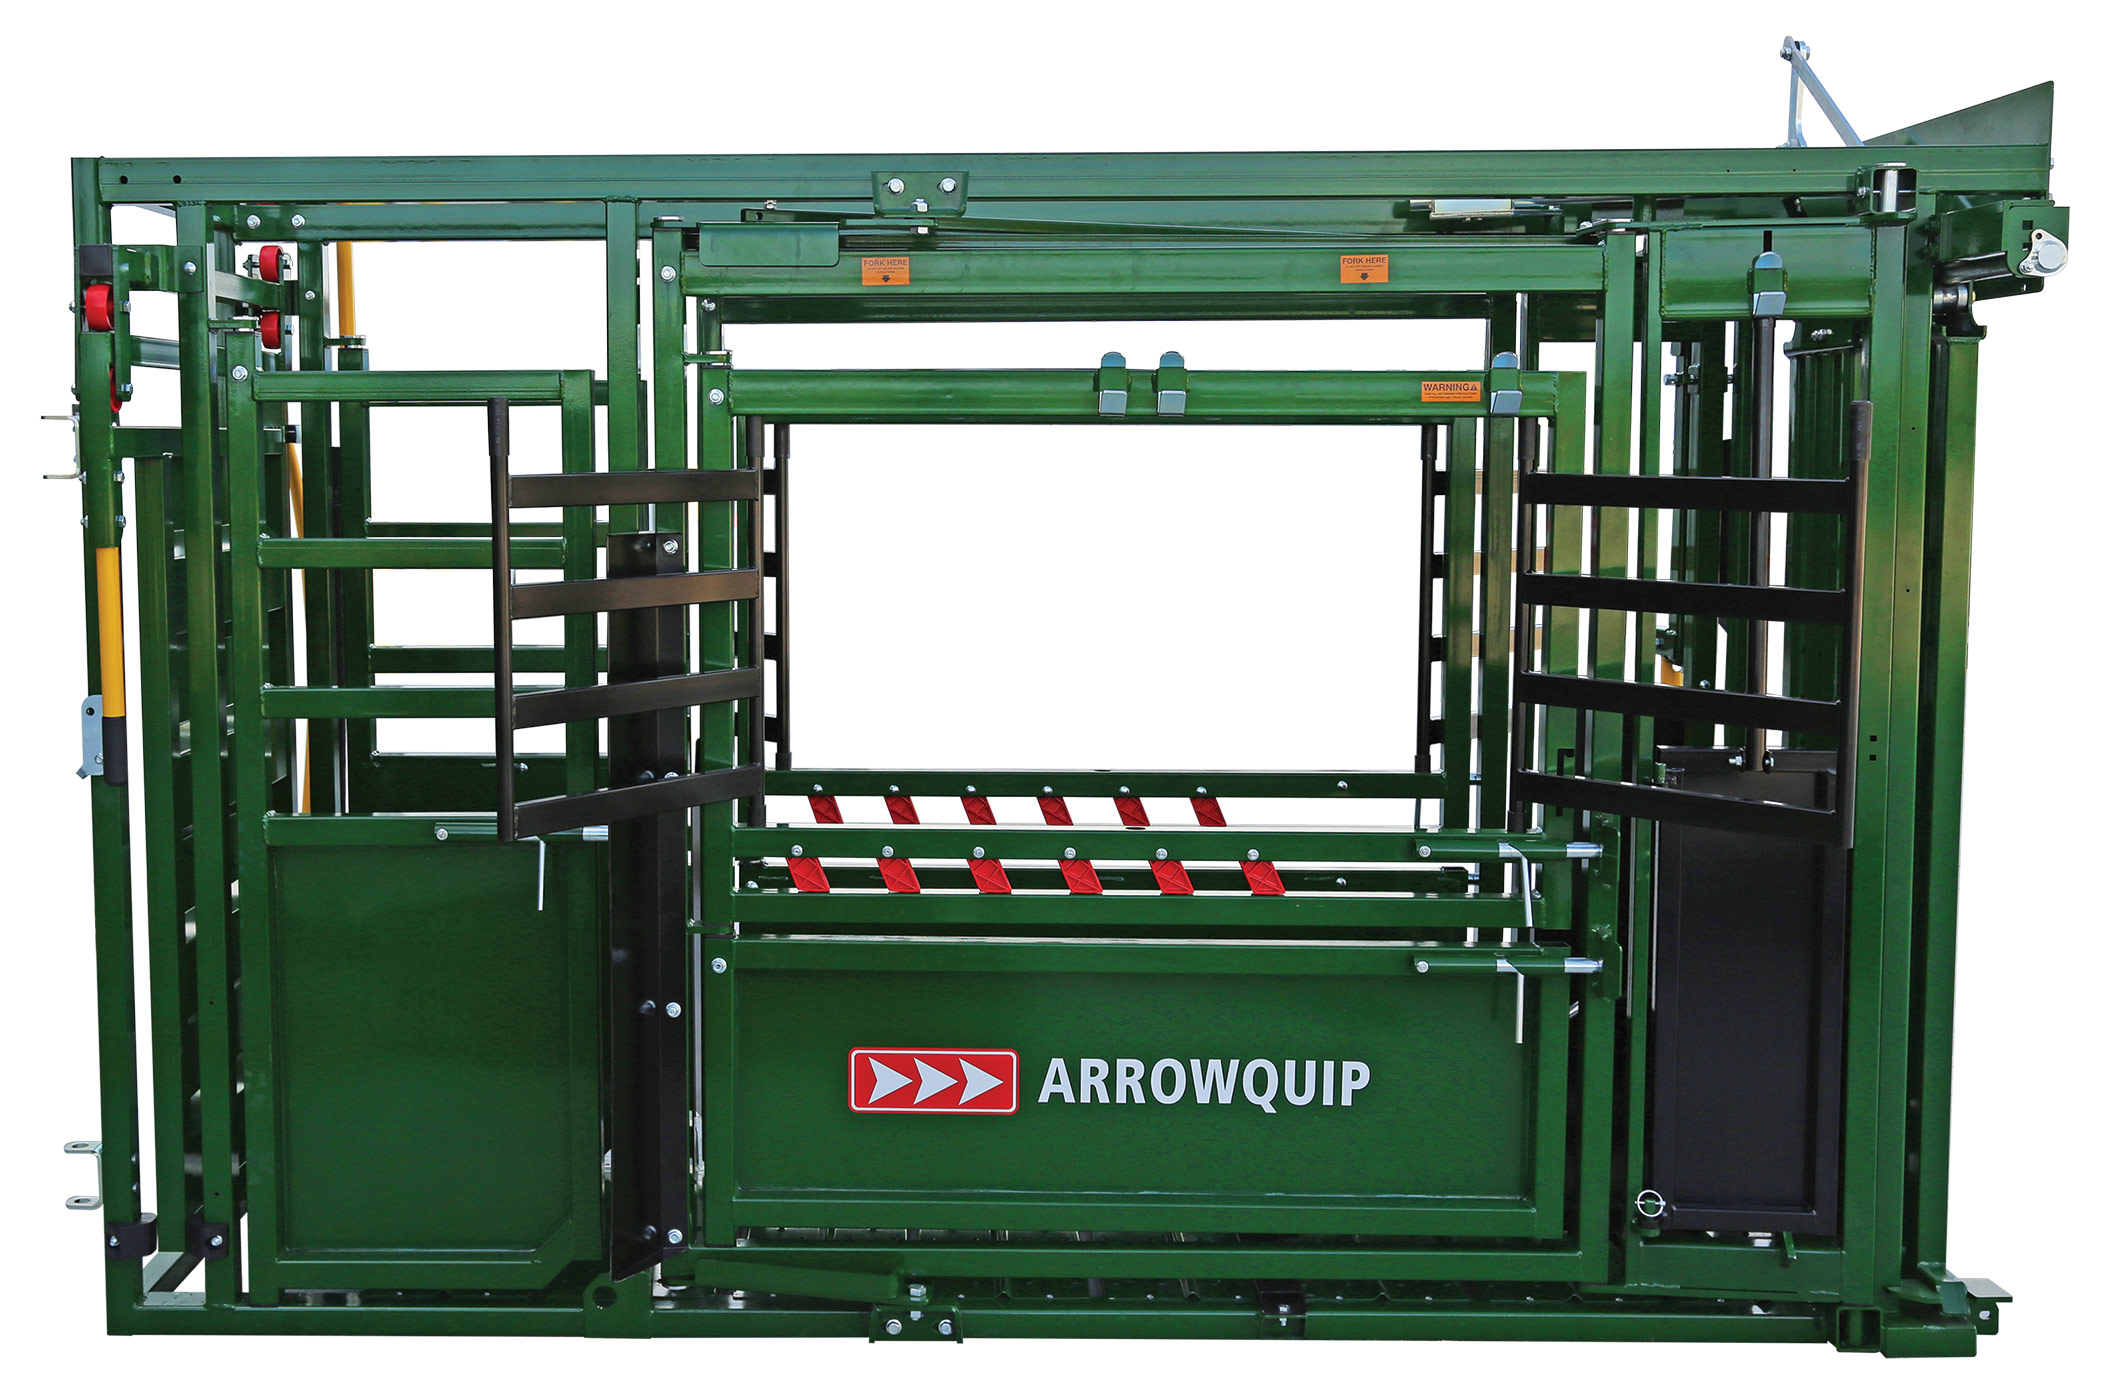 7400-opposite-side-side-panel-access